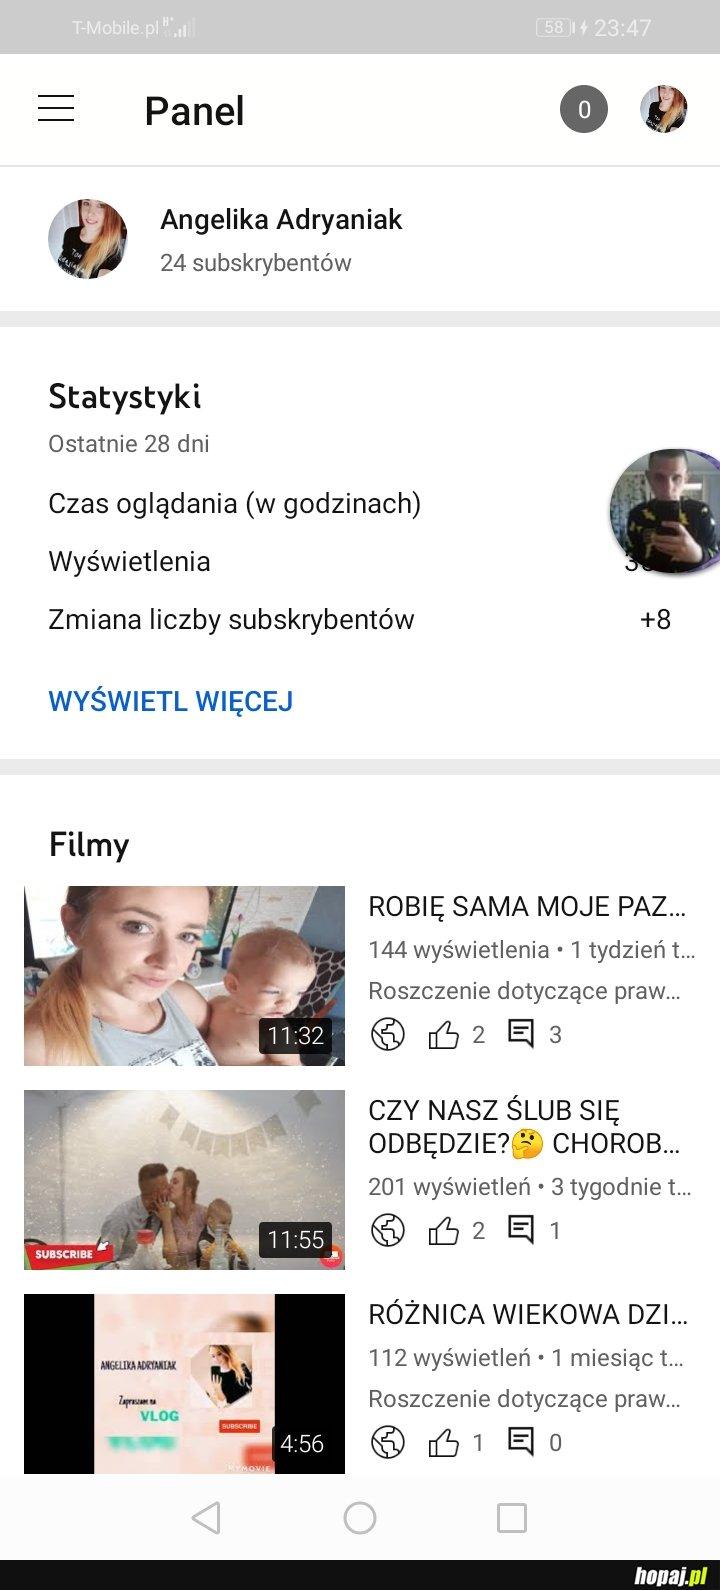 Https://youtube.com/channel/UC41ysG10gvgrSvcOKcmOCwA